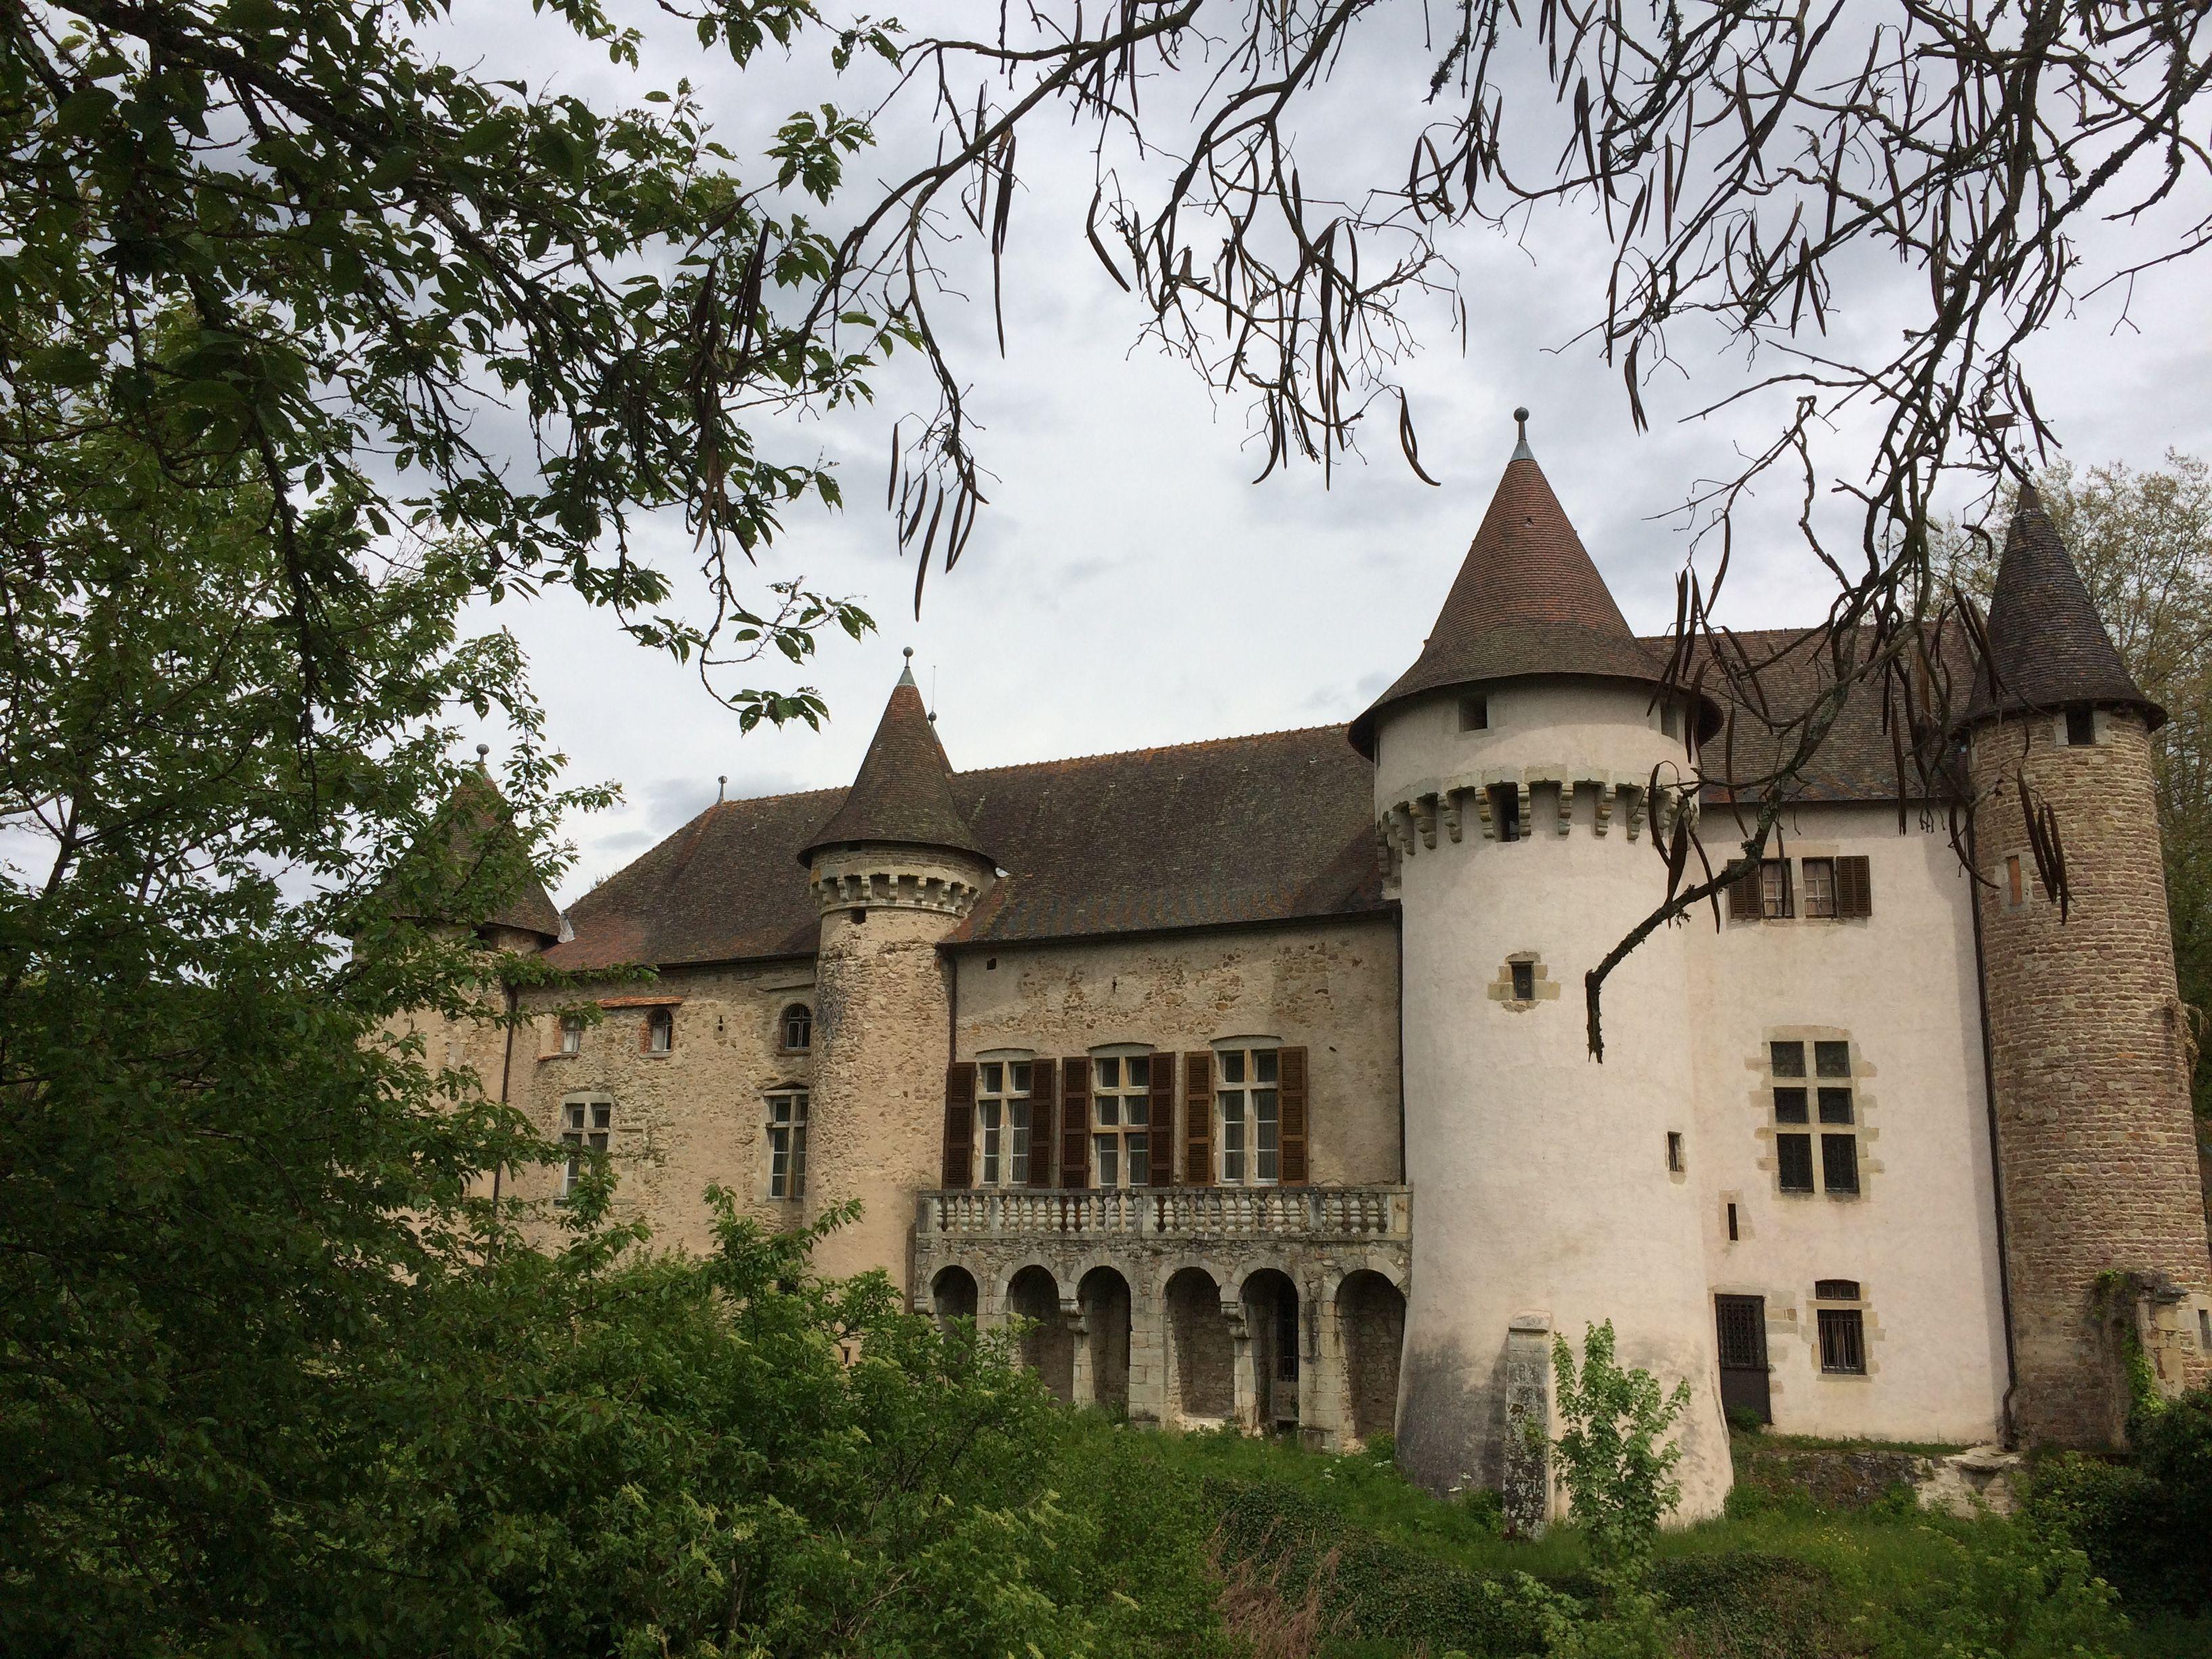 Château d'Aulteribe Chateau france, Voyage, France